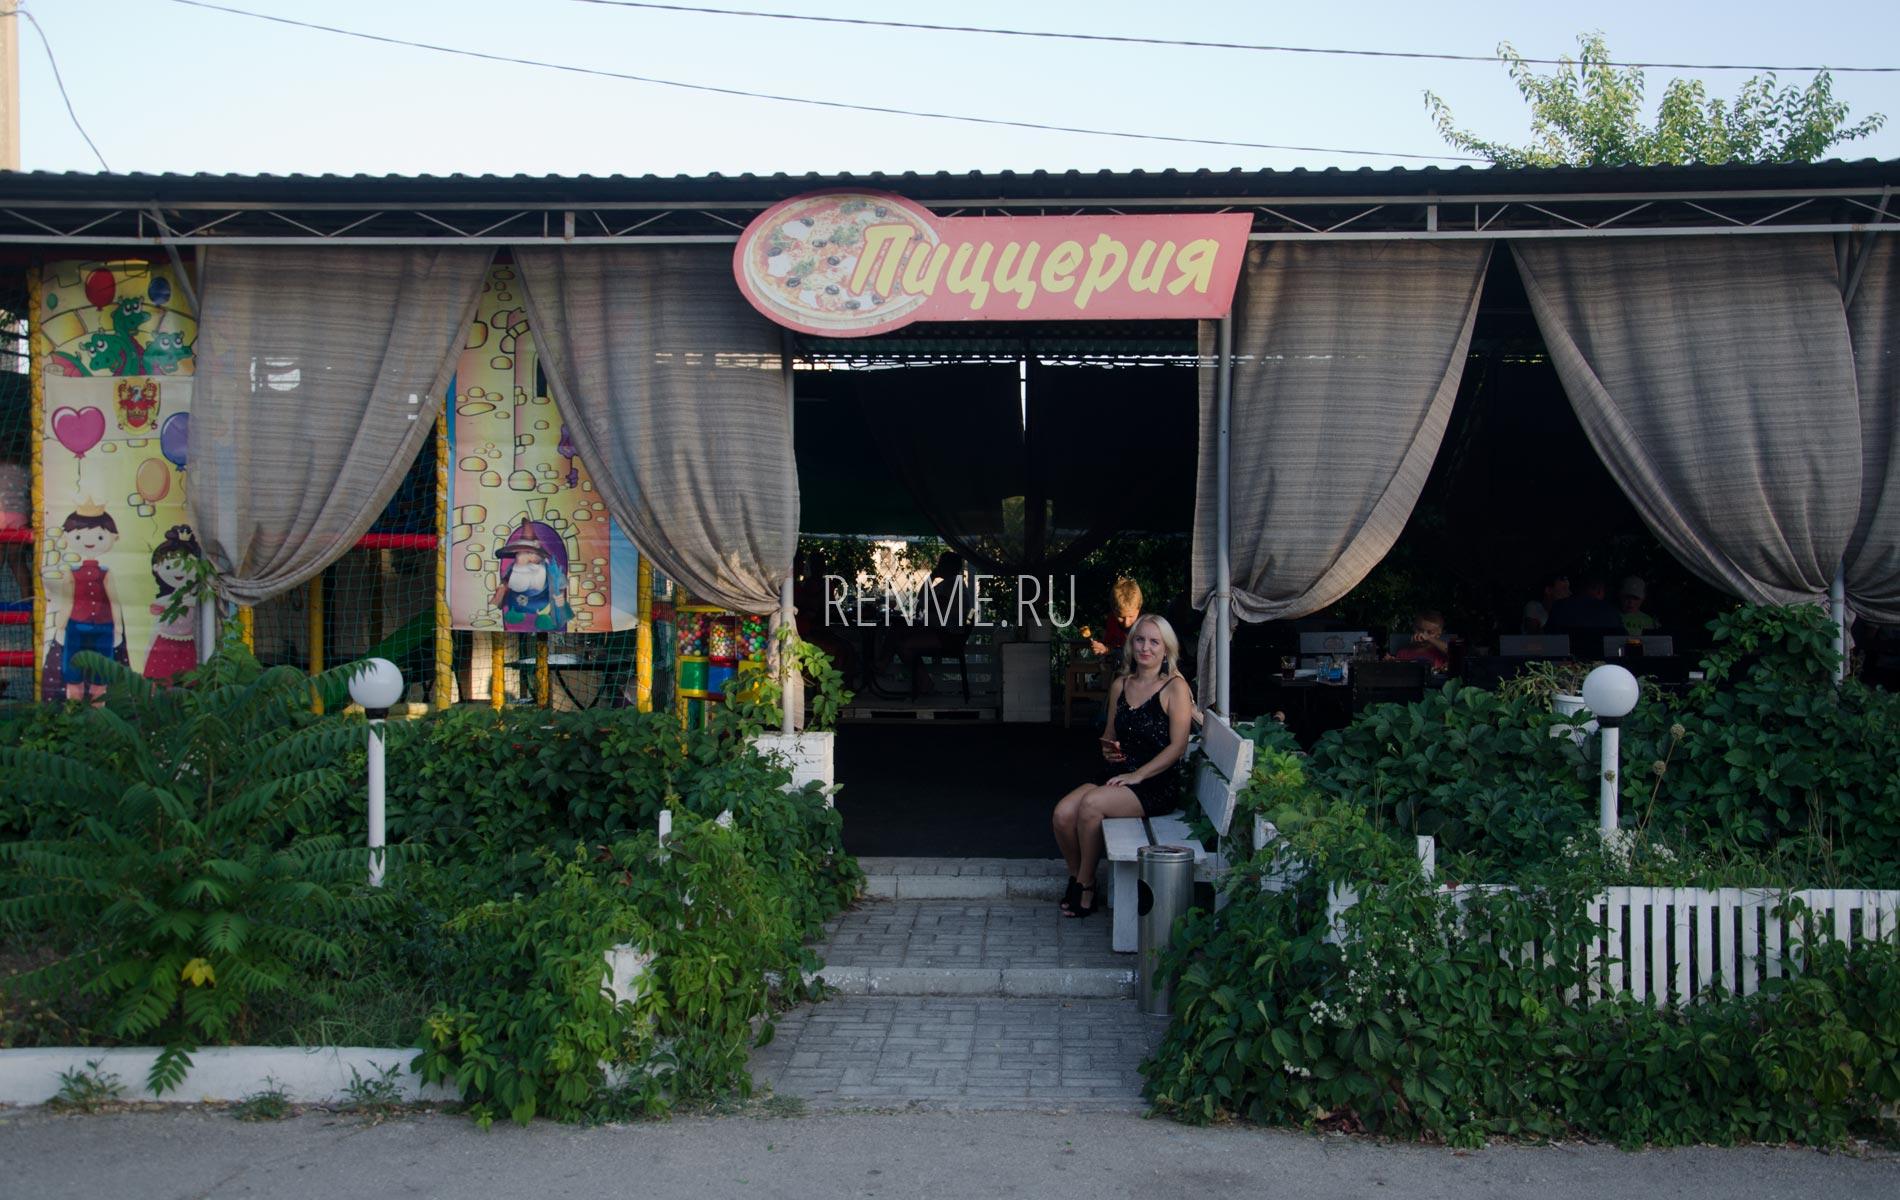 Пиццерия в июле 2020. Фото Заозёрного